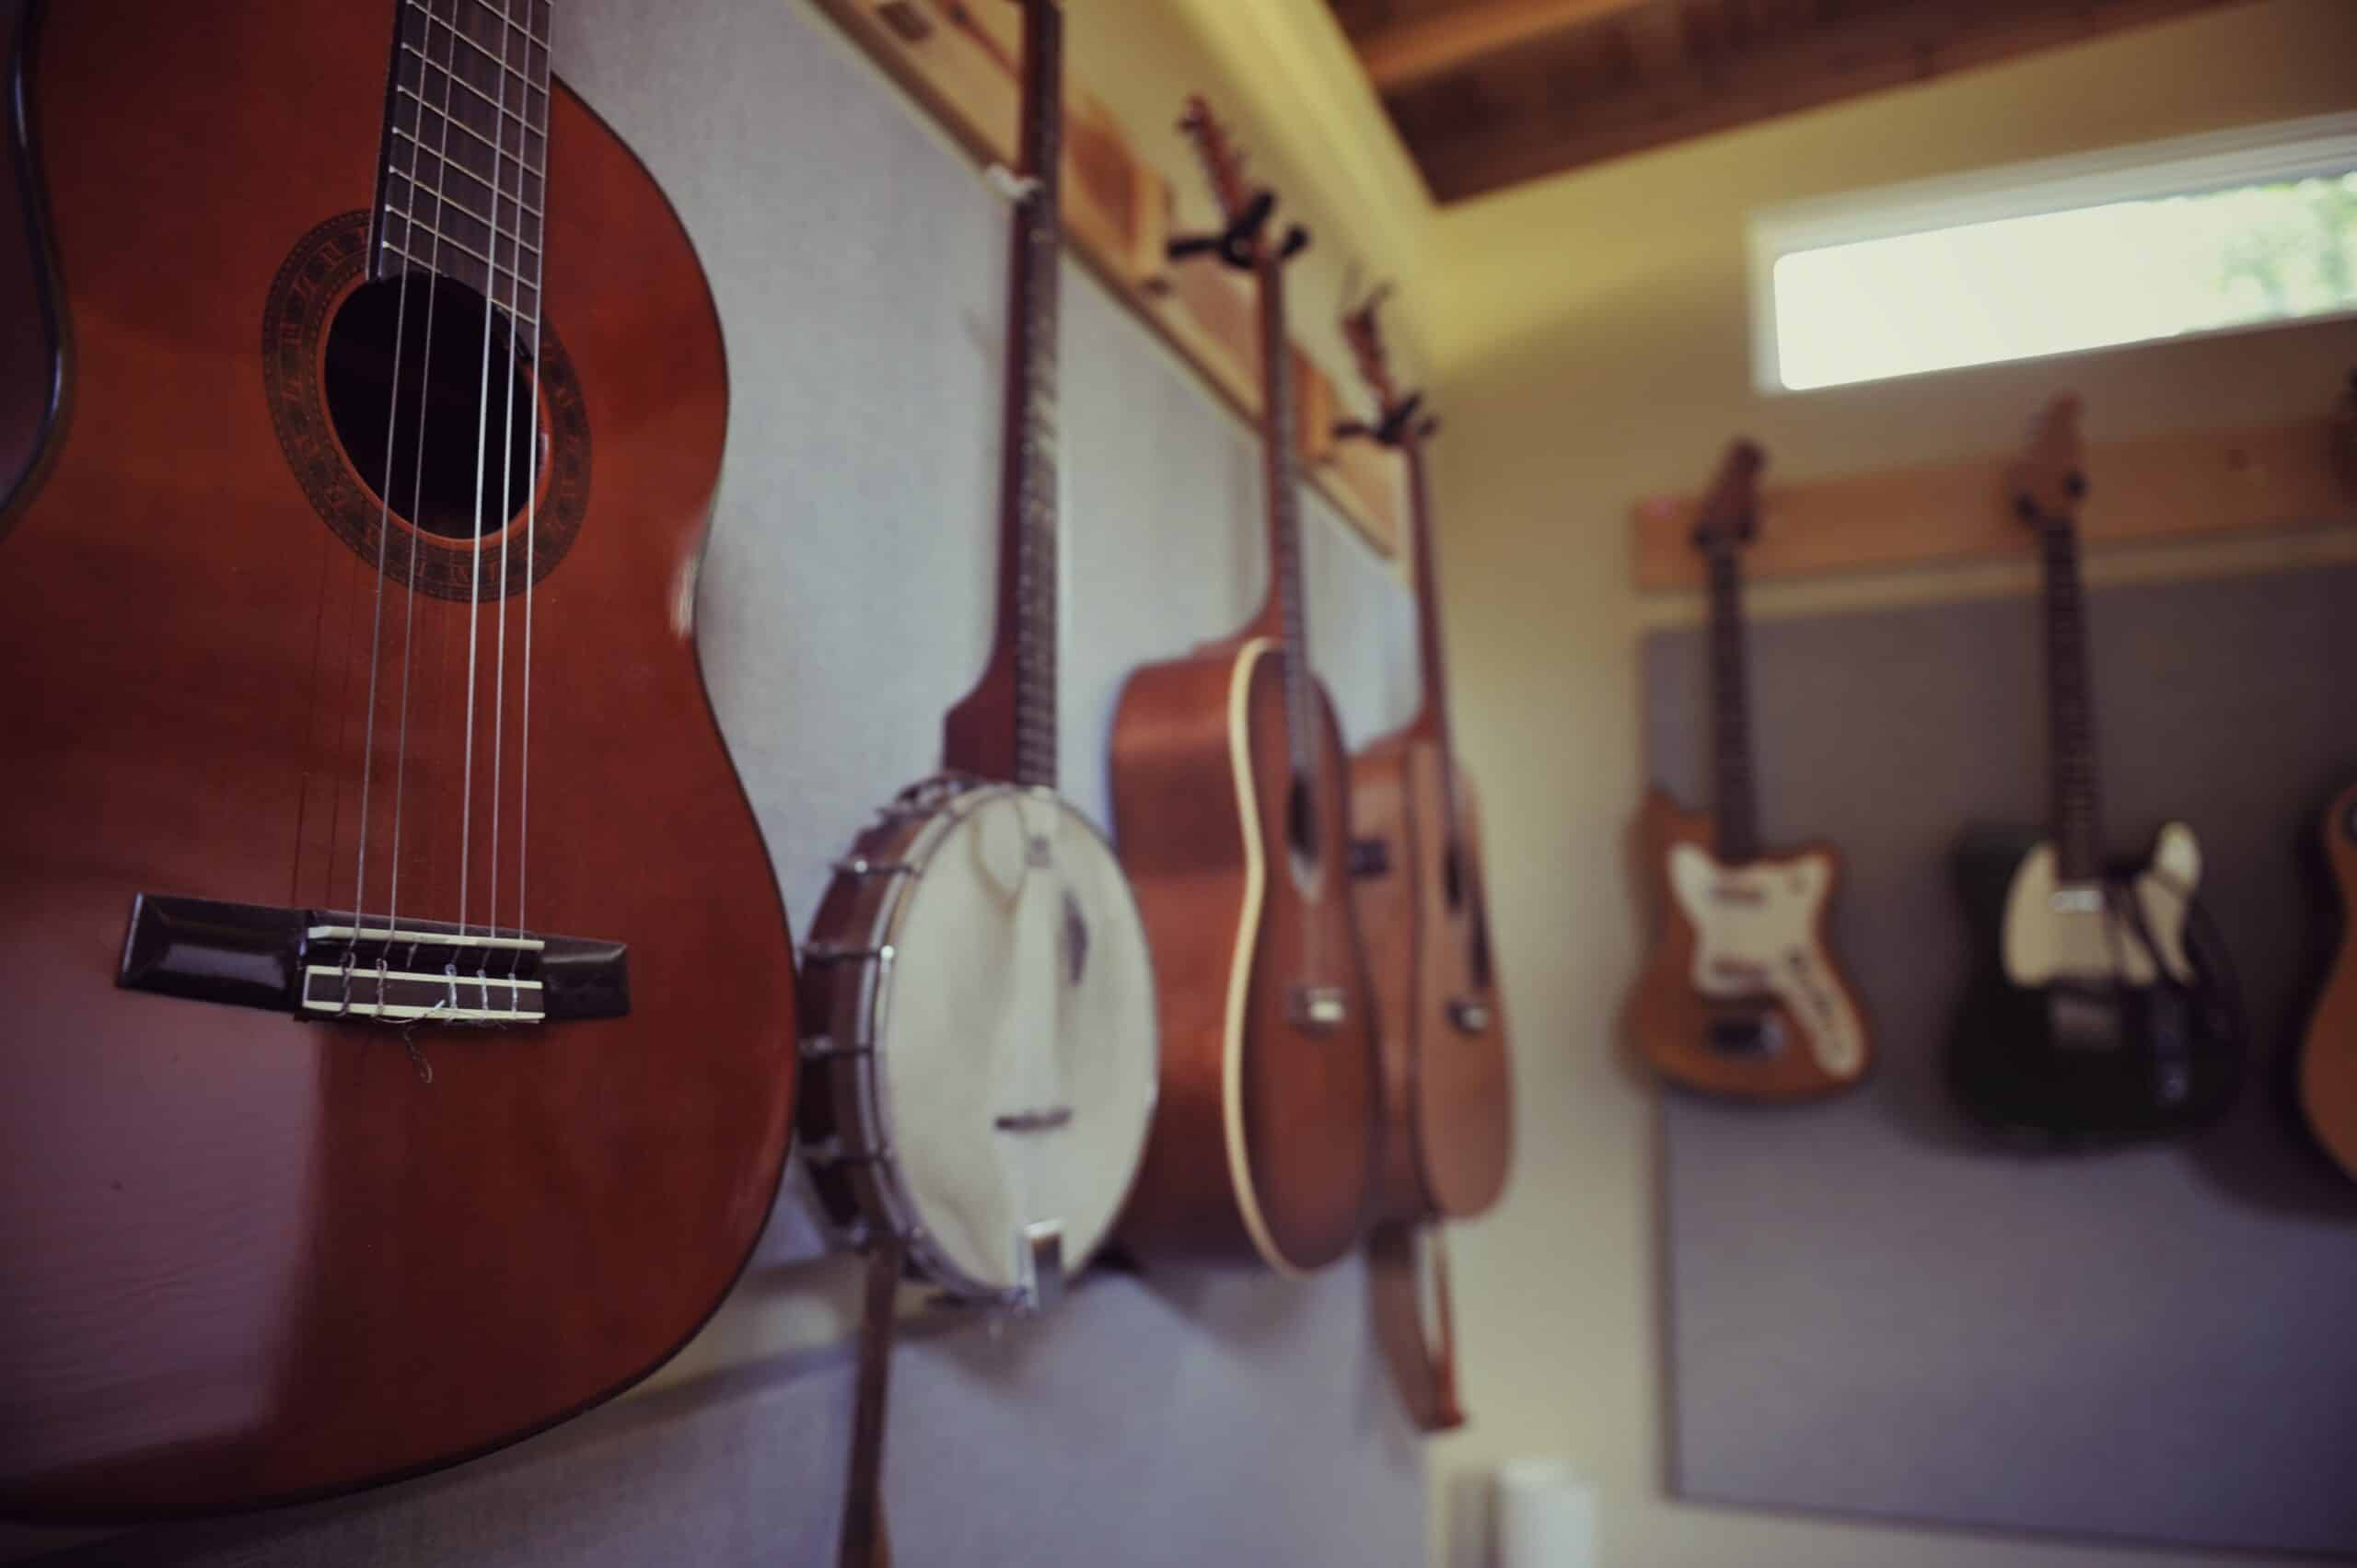 The Urban Studio Meets Music - Summerwood Products